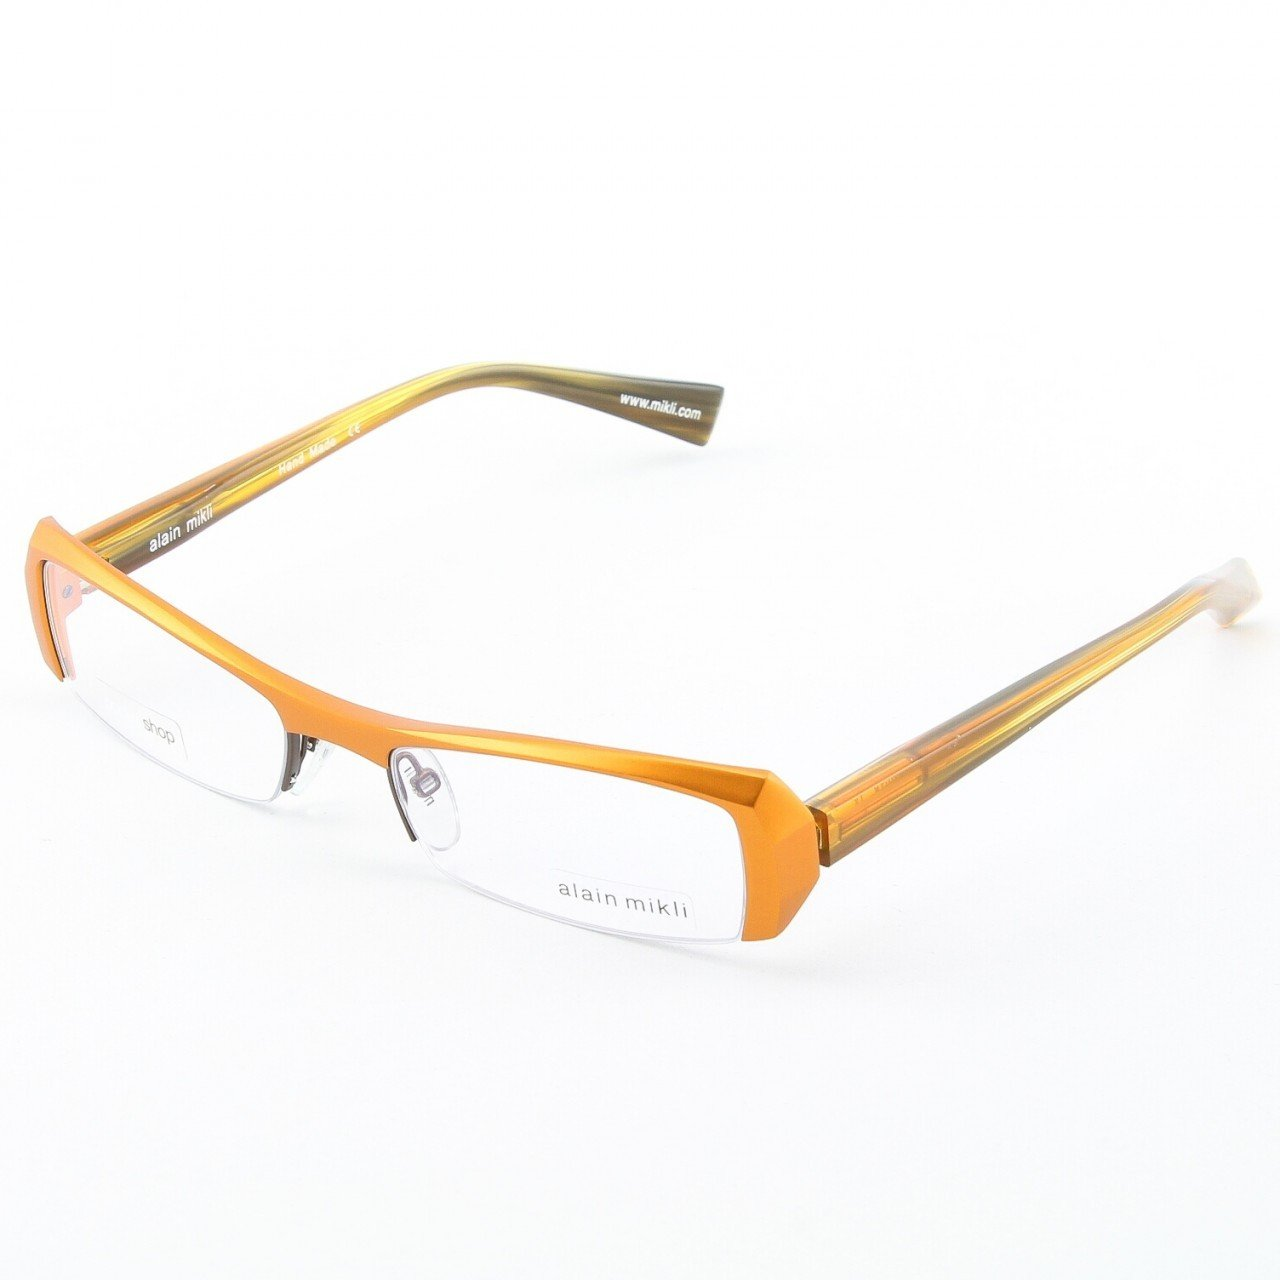 Alain Mikli Eyeglasses AL0613 Col. 13 Butterscotch Metallic with Translucent Butterscoth Temples